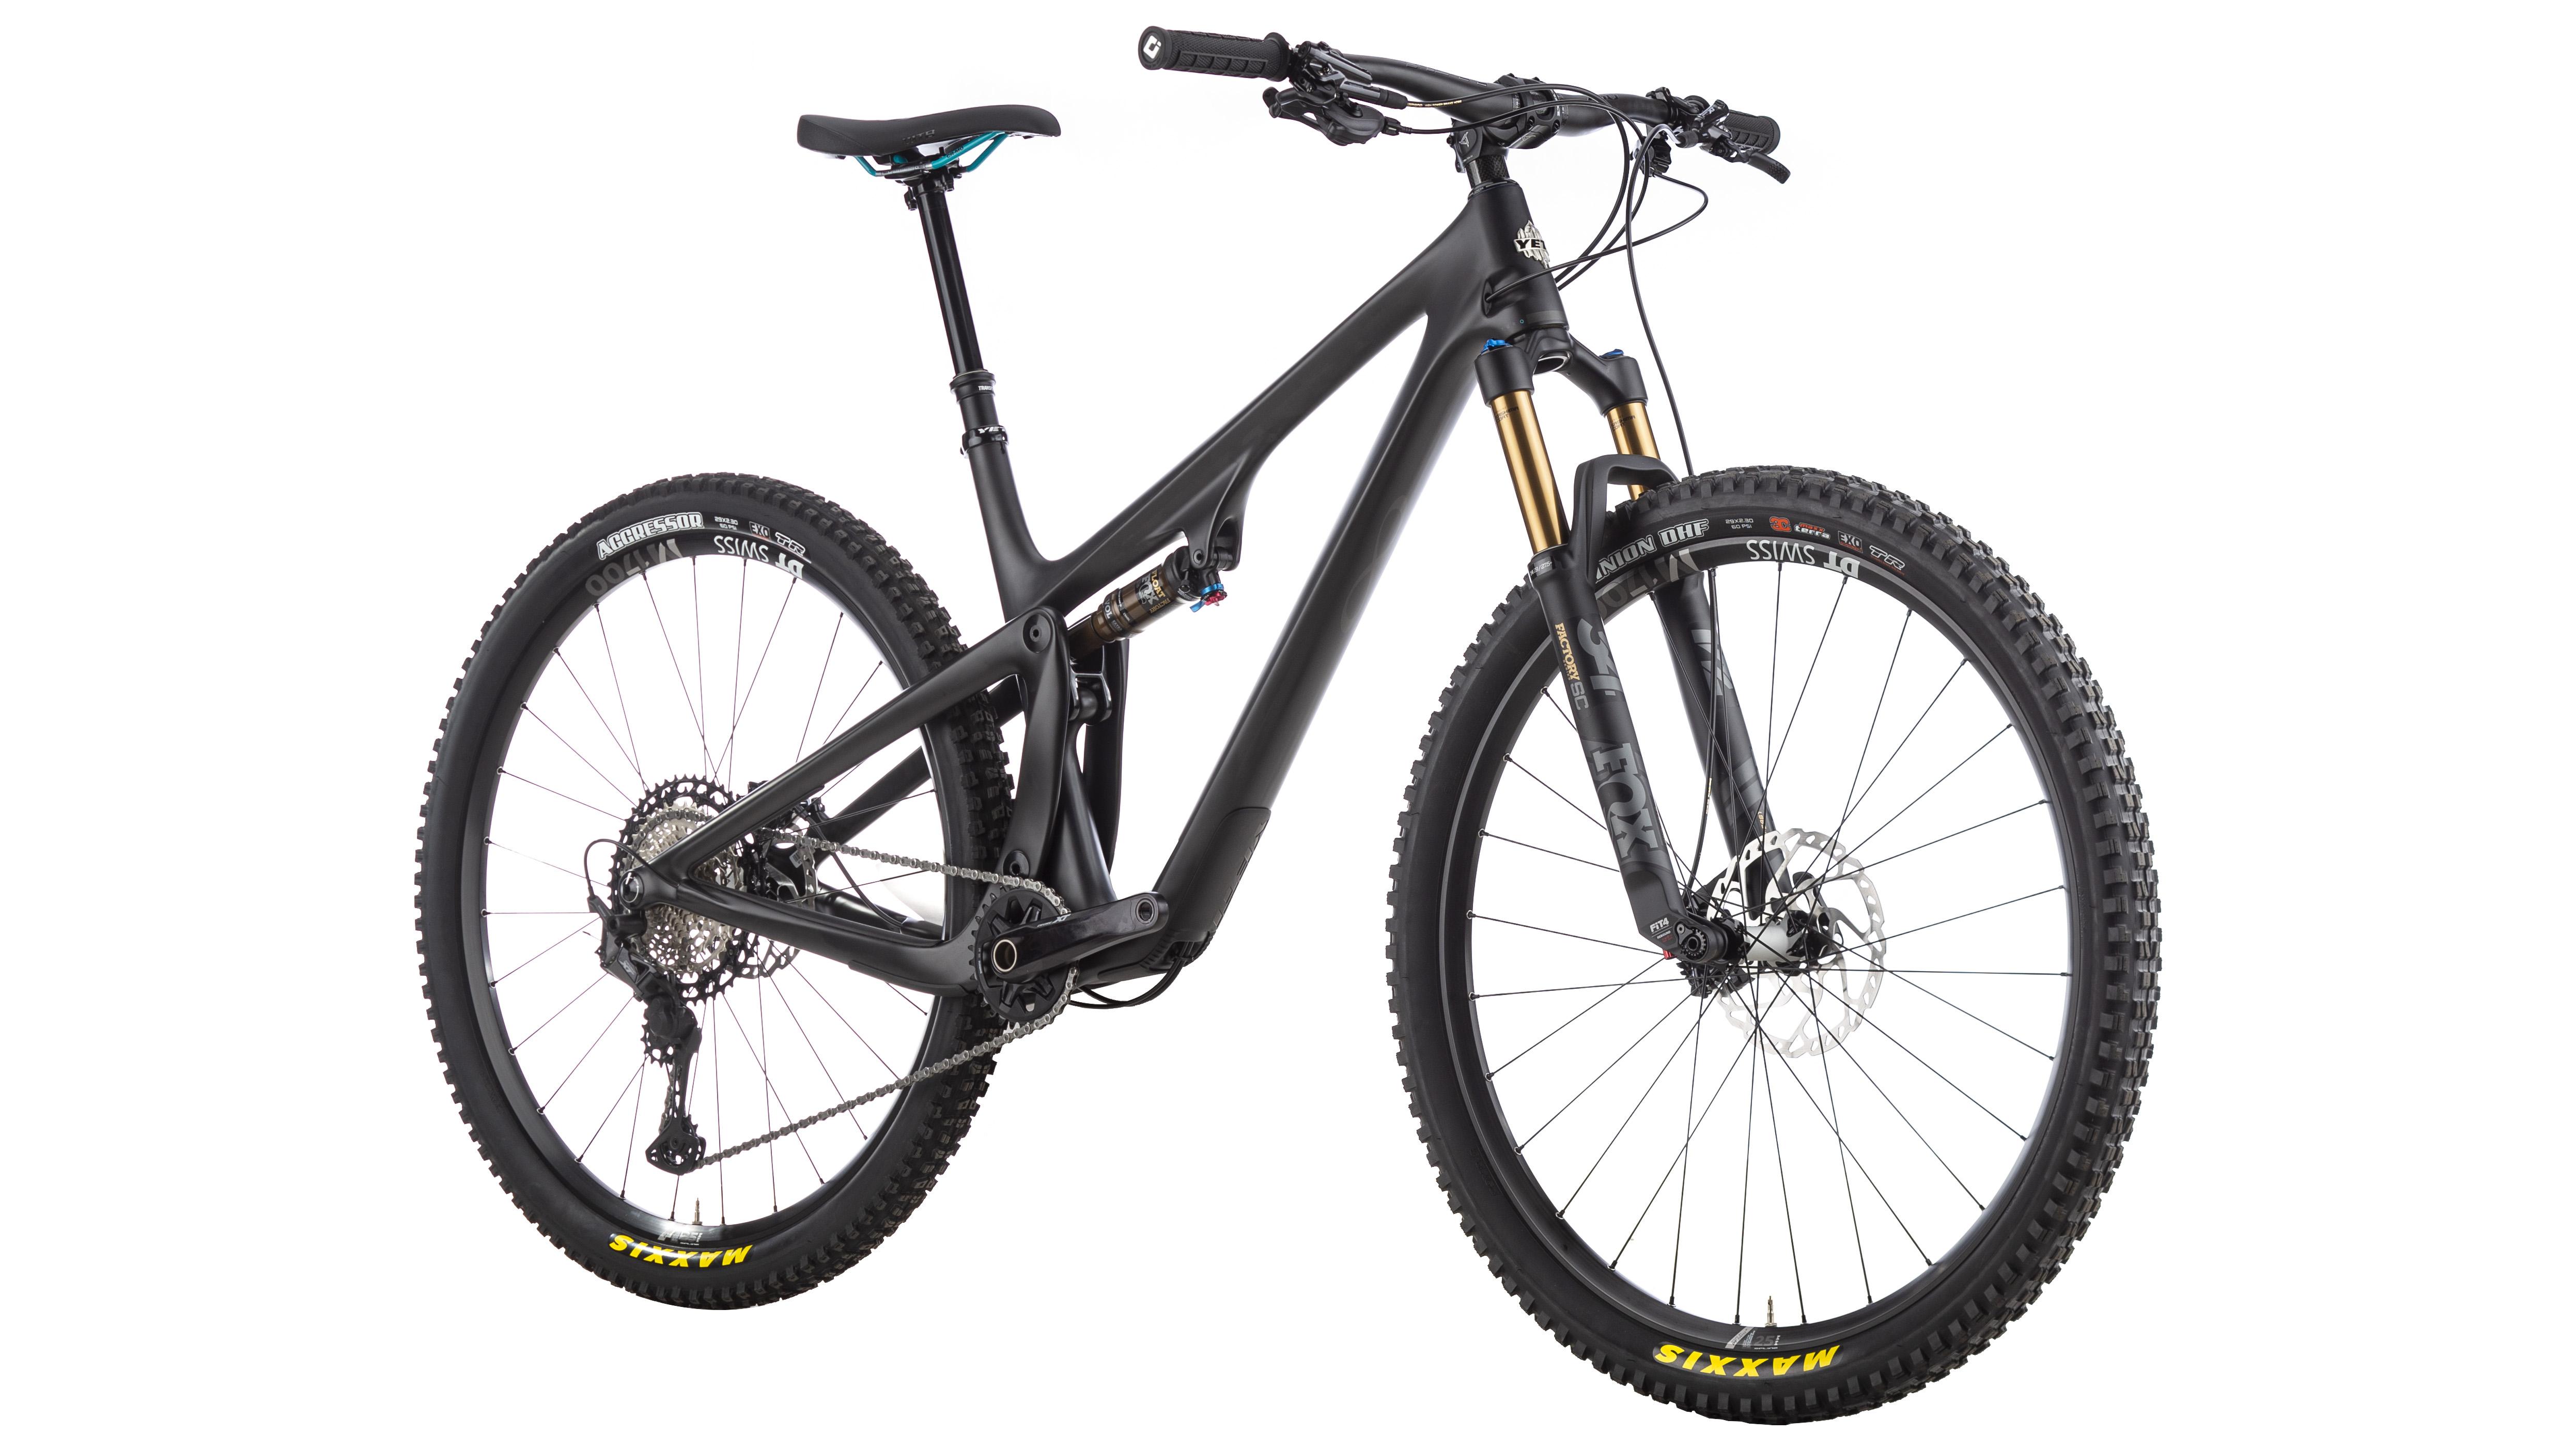 Yeti SB100 mountain bike review